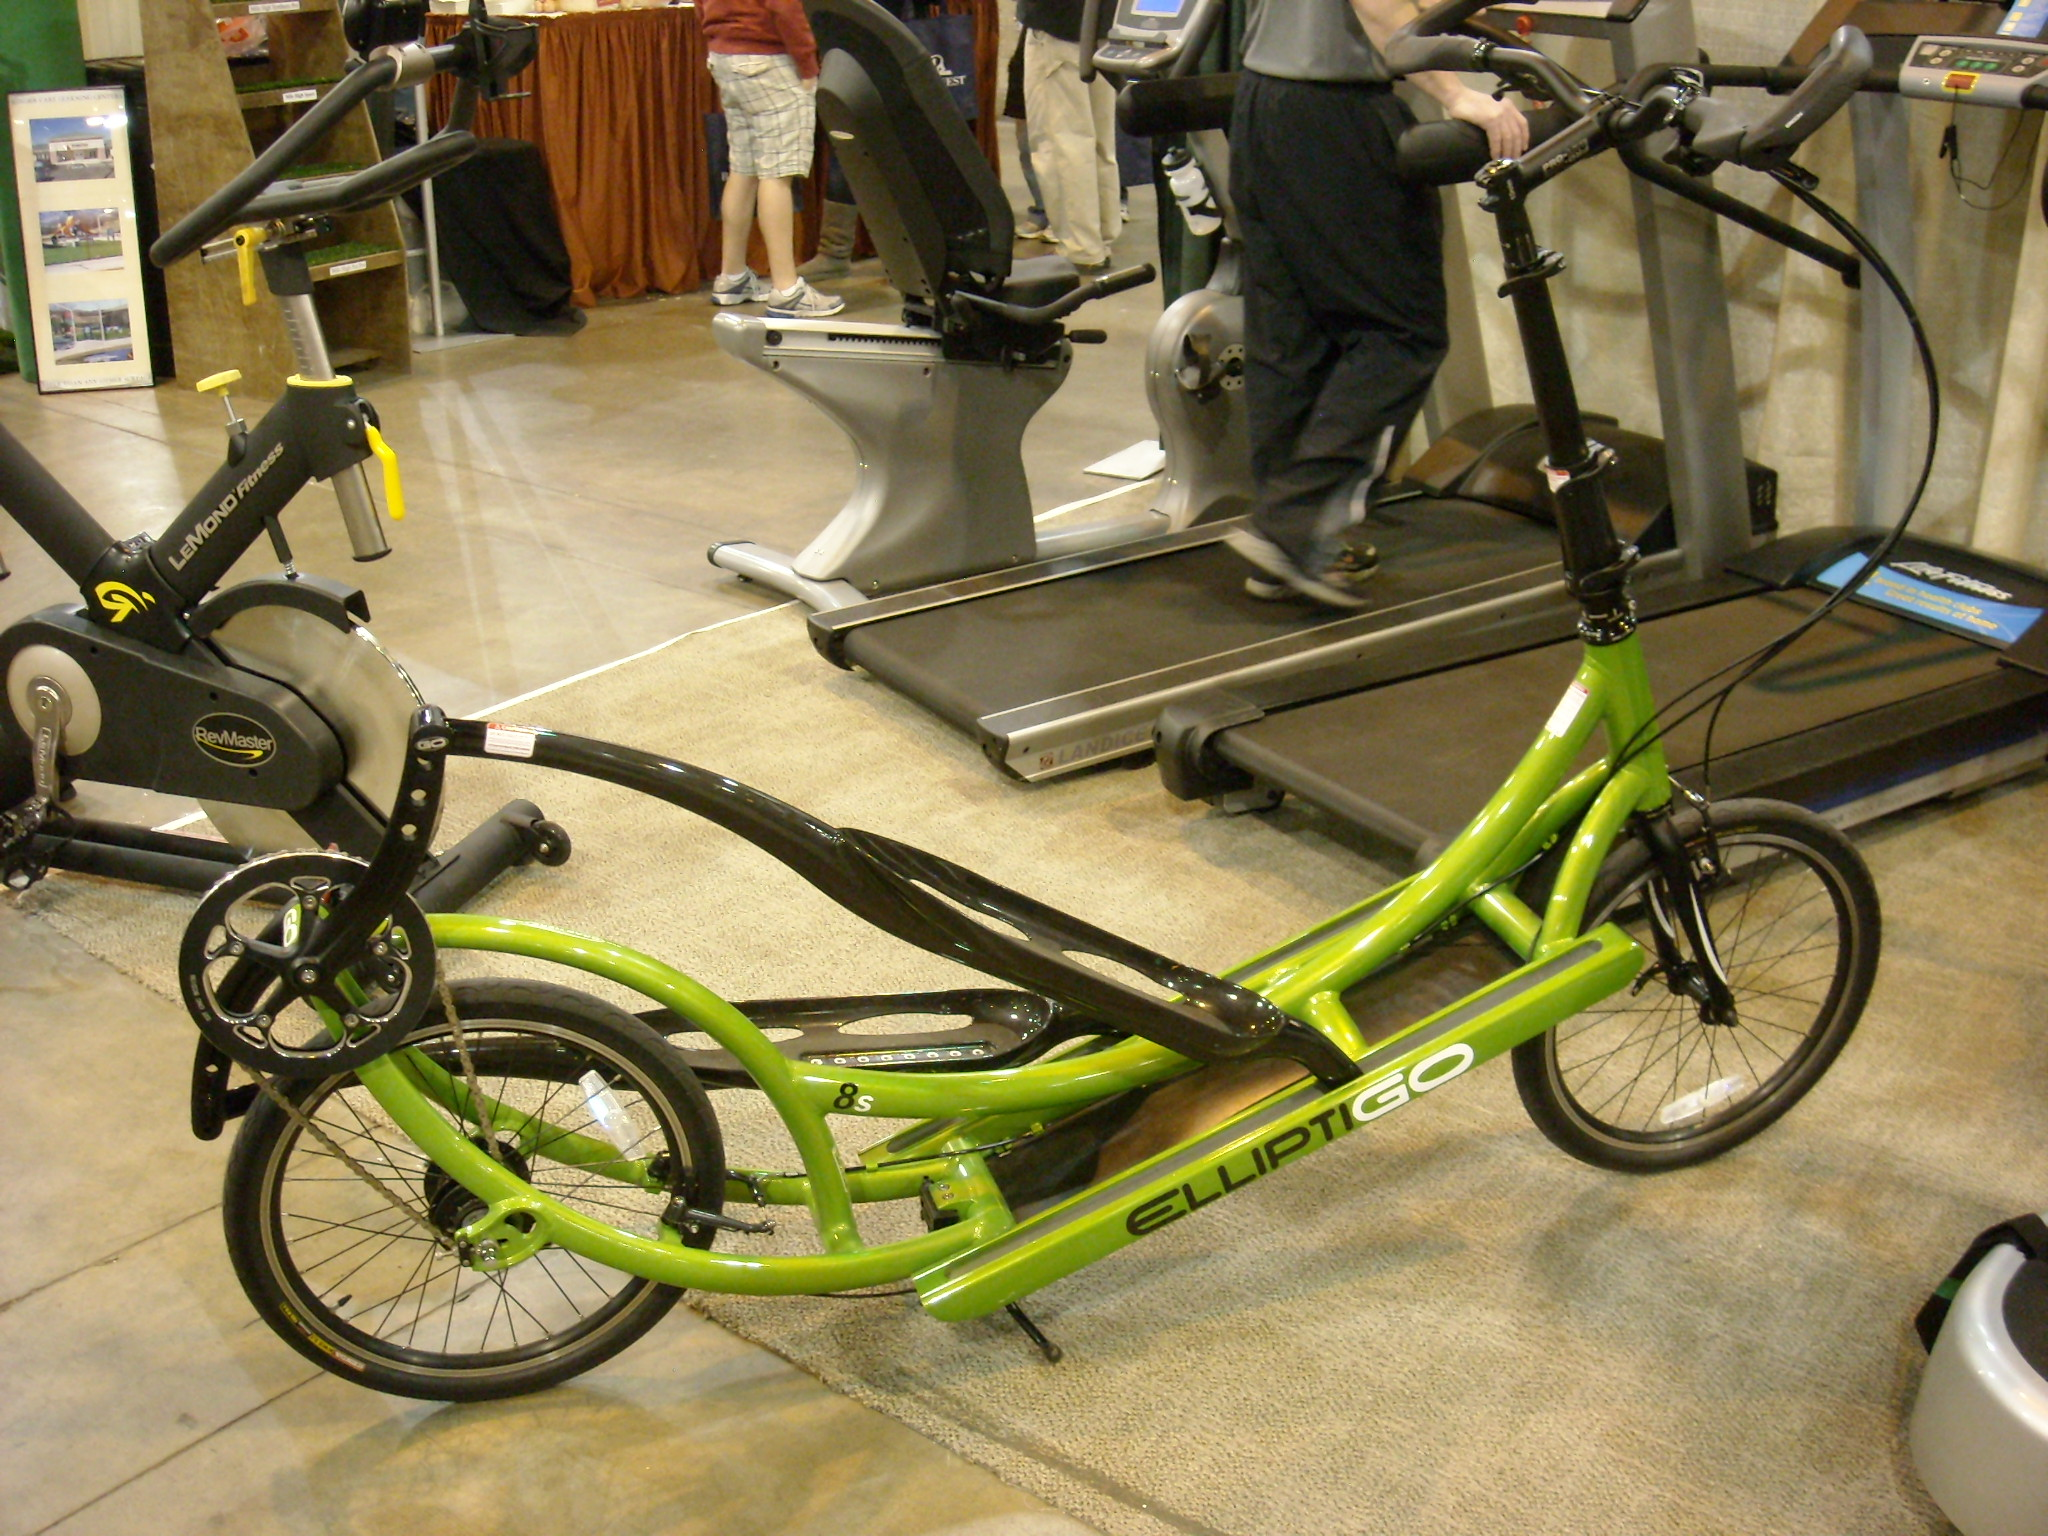 An Elliptical Bicycle.